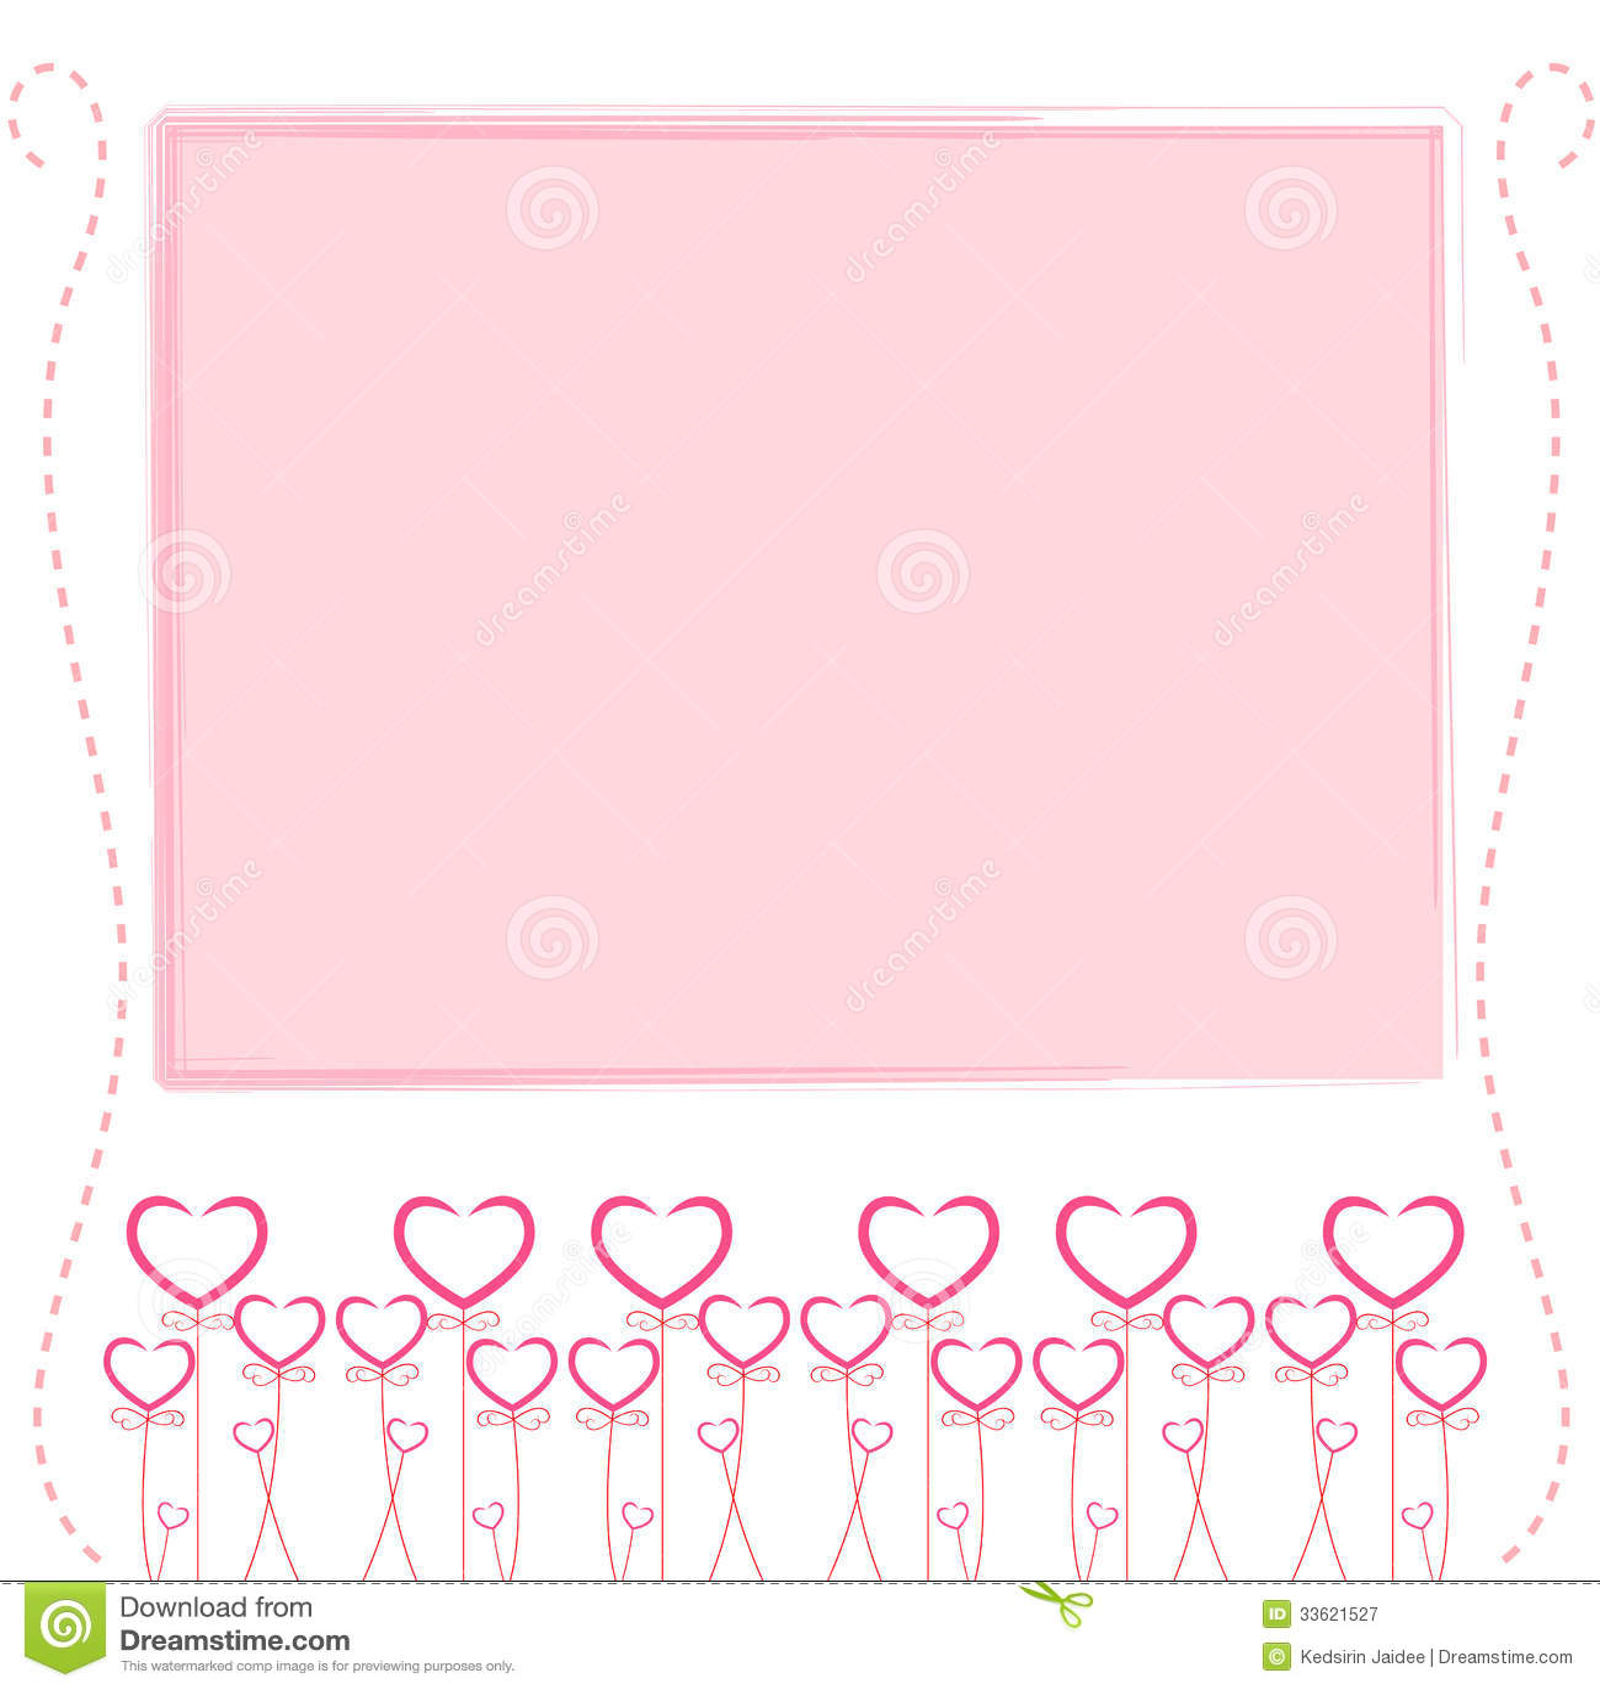 Cute Owl Wallpaper Border Cute Pink Background Cute Card Of Love Stock Vector